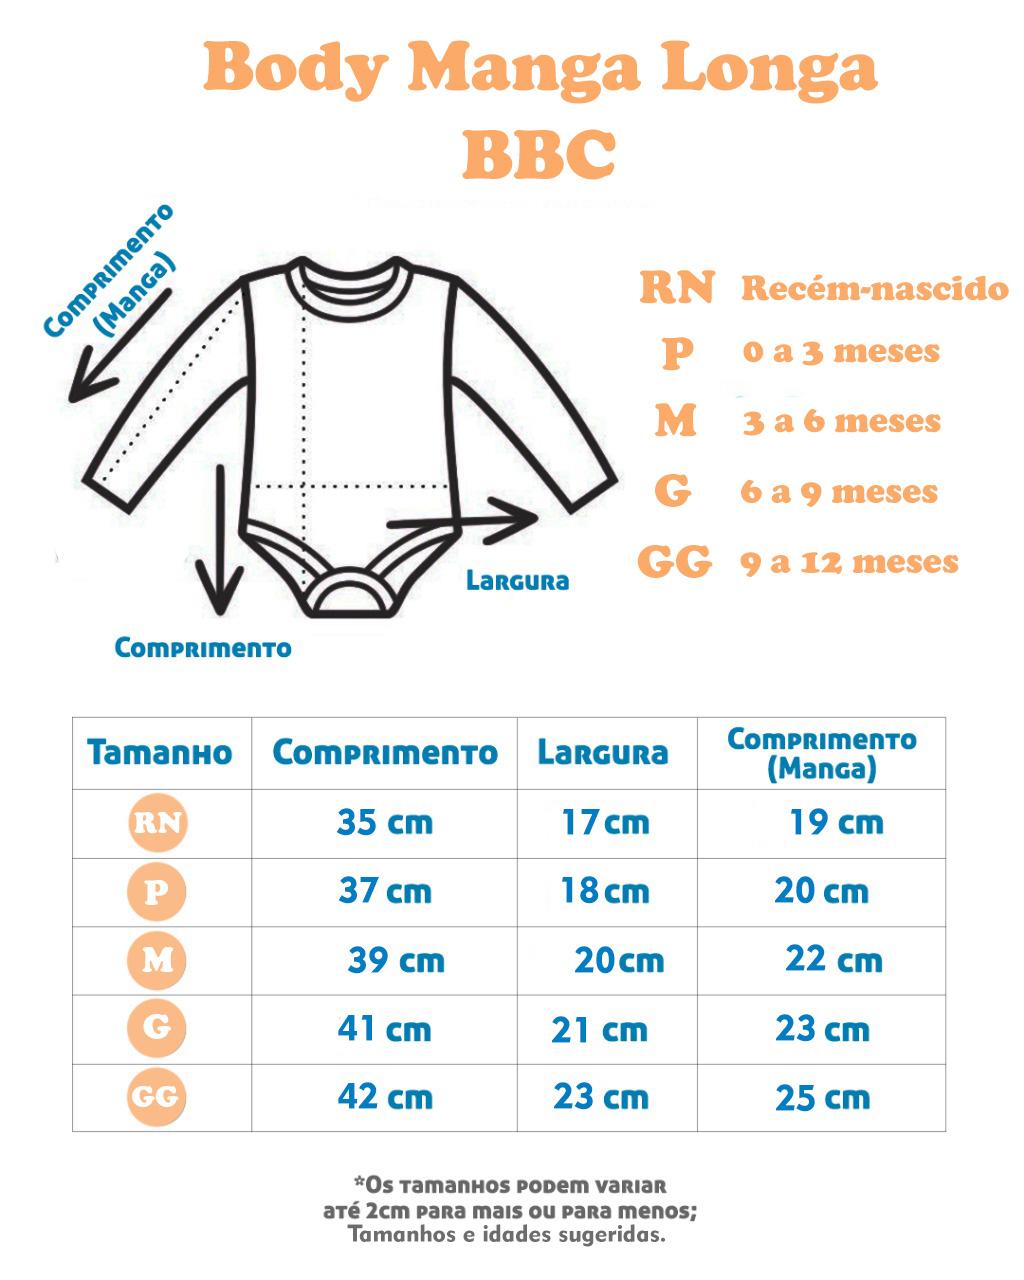 Body Manga Longa Unicórnio (RN/P/M/G/GG)